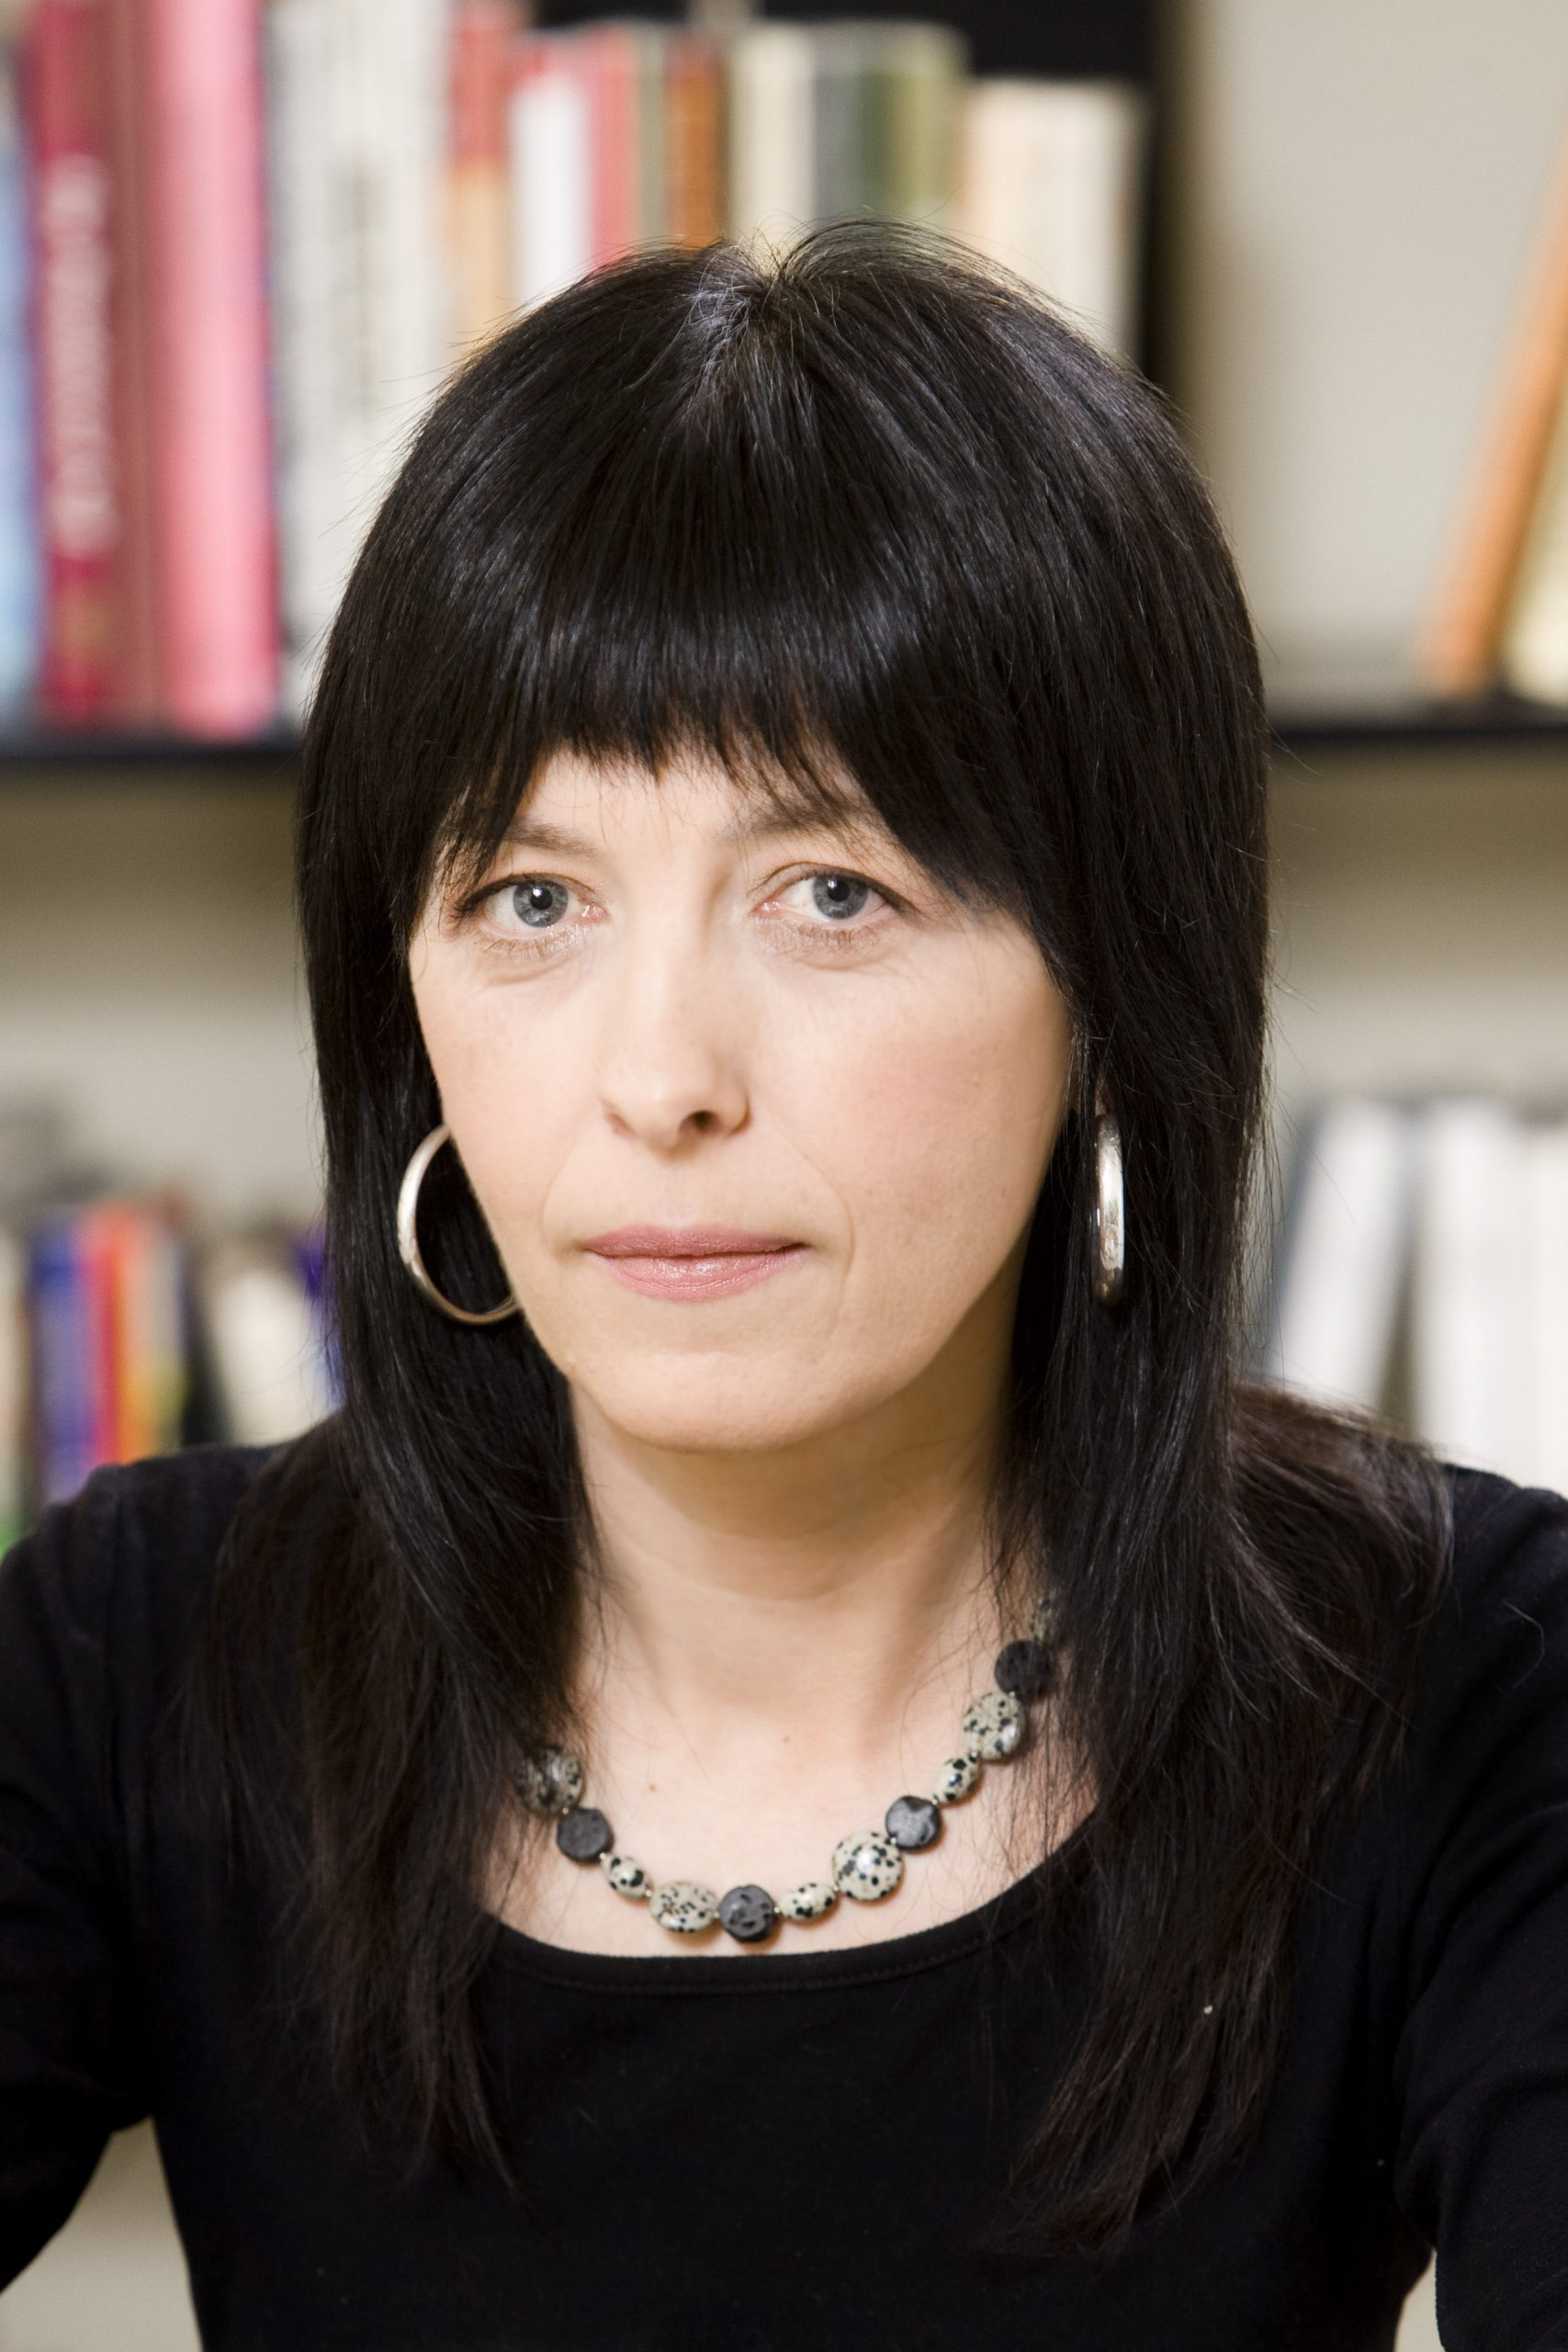 Vilma Kuzmienė